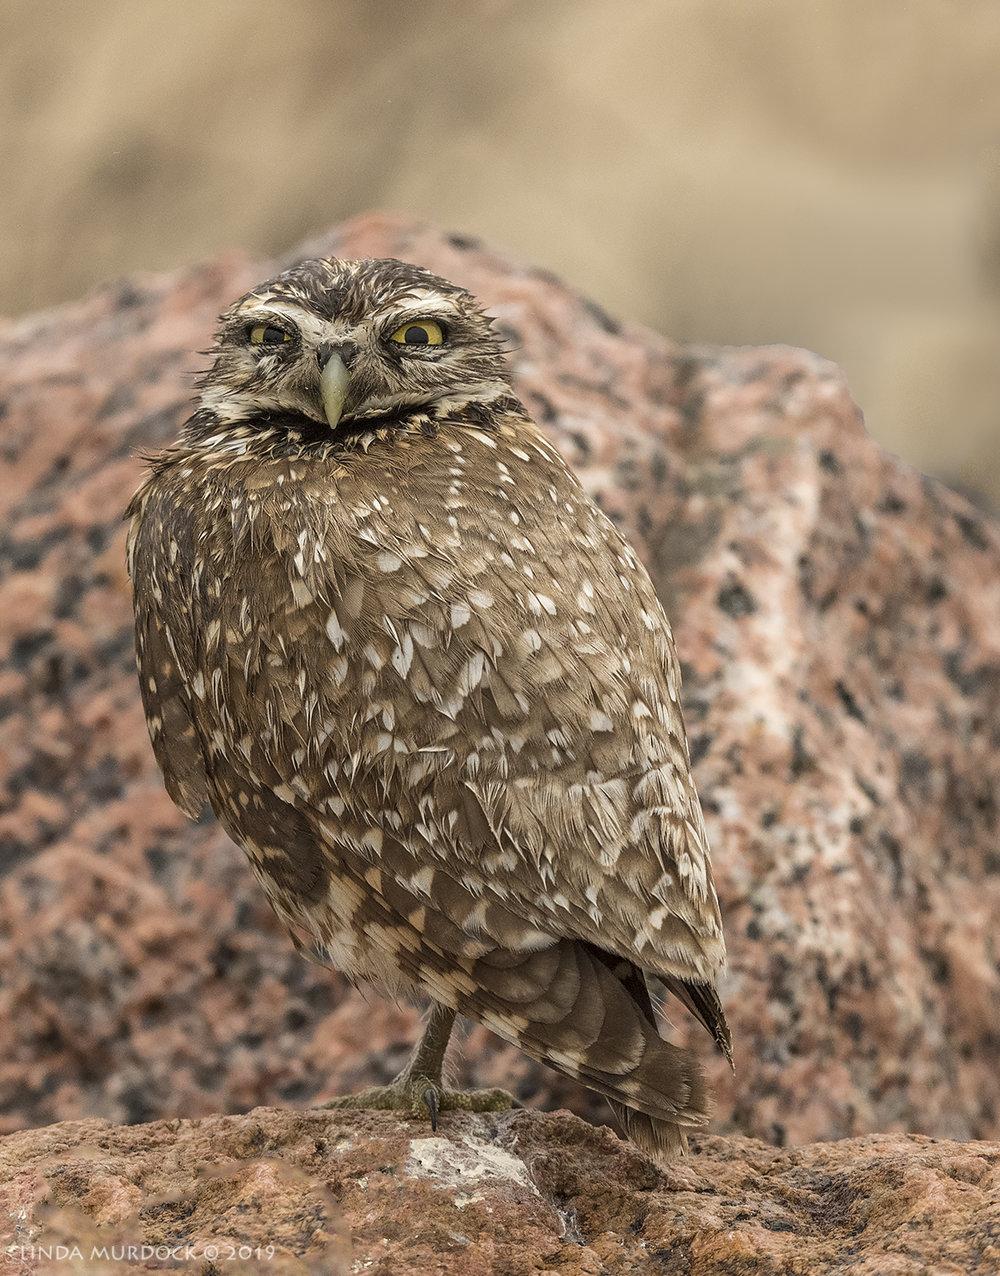 Sandy the Matagorda Burrowing Owl  Nikon D850 with Nikkor 500 f/5.6 PF VR ~ 1/2000 sec f/5.6 ISO 1250; hand-held